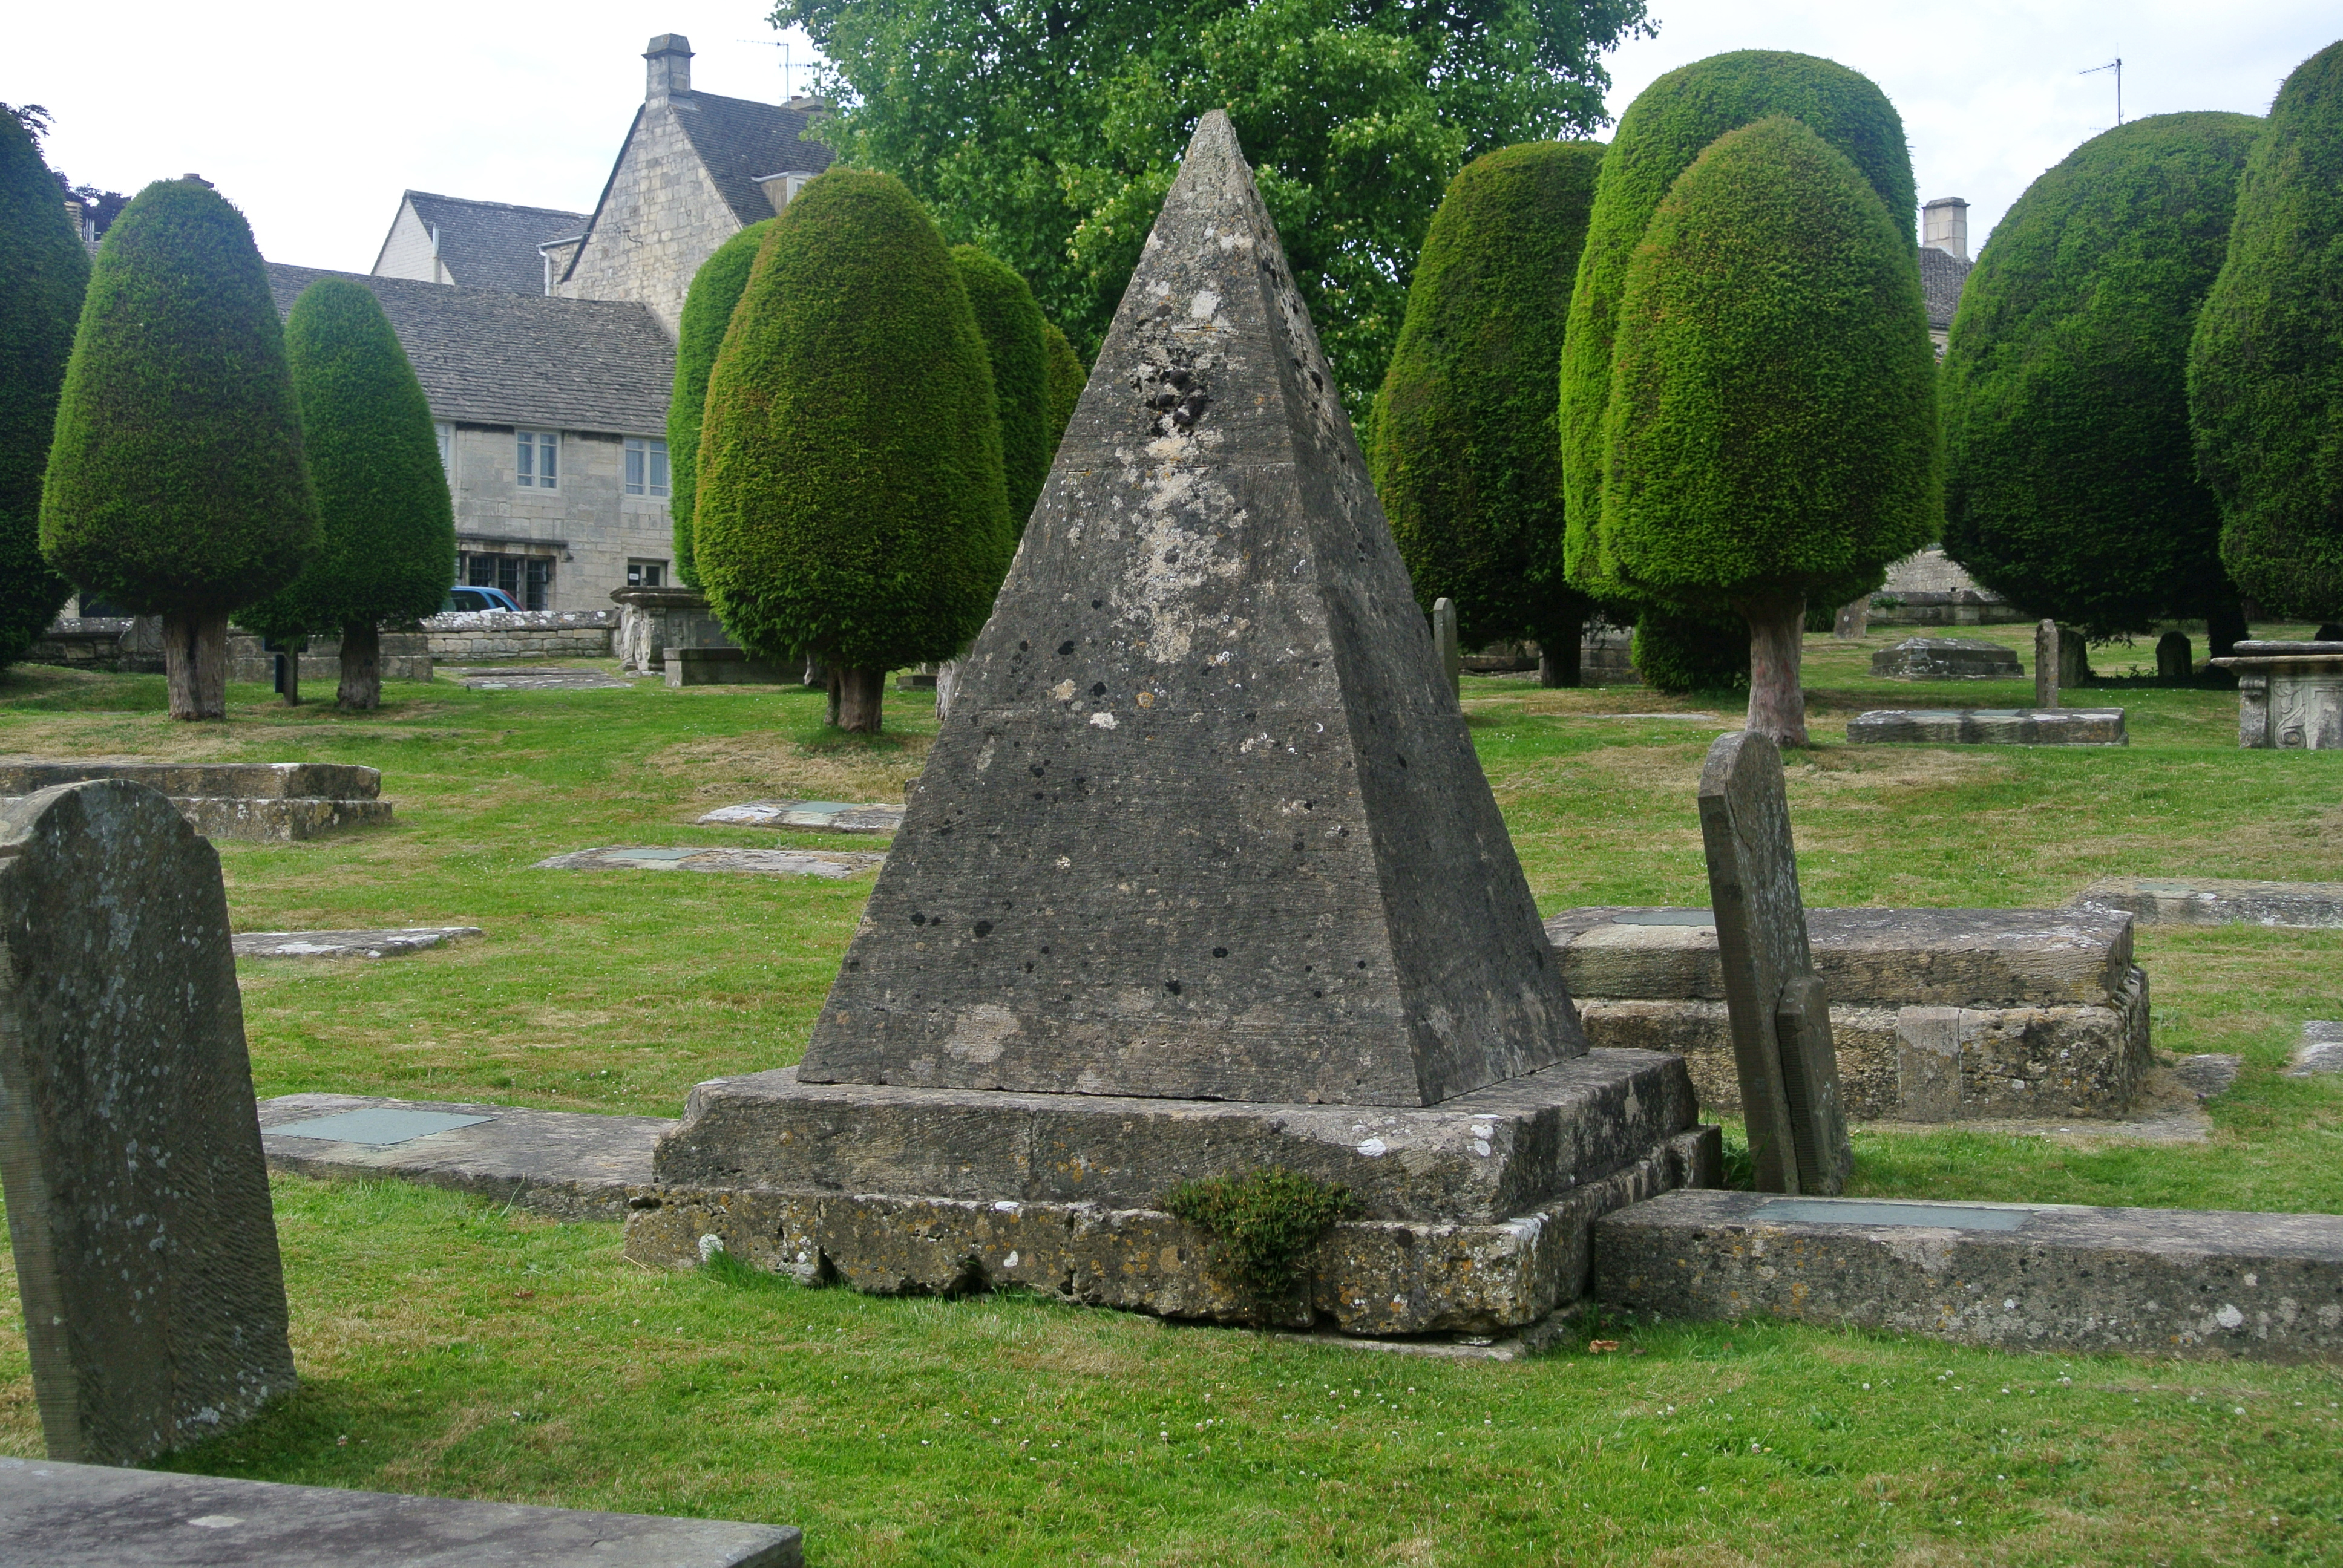 Pyramidal tomb of the stonemason John Bryan in Painswick, Gloucestershire. Photo taken on June 25, 2015.